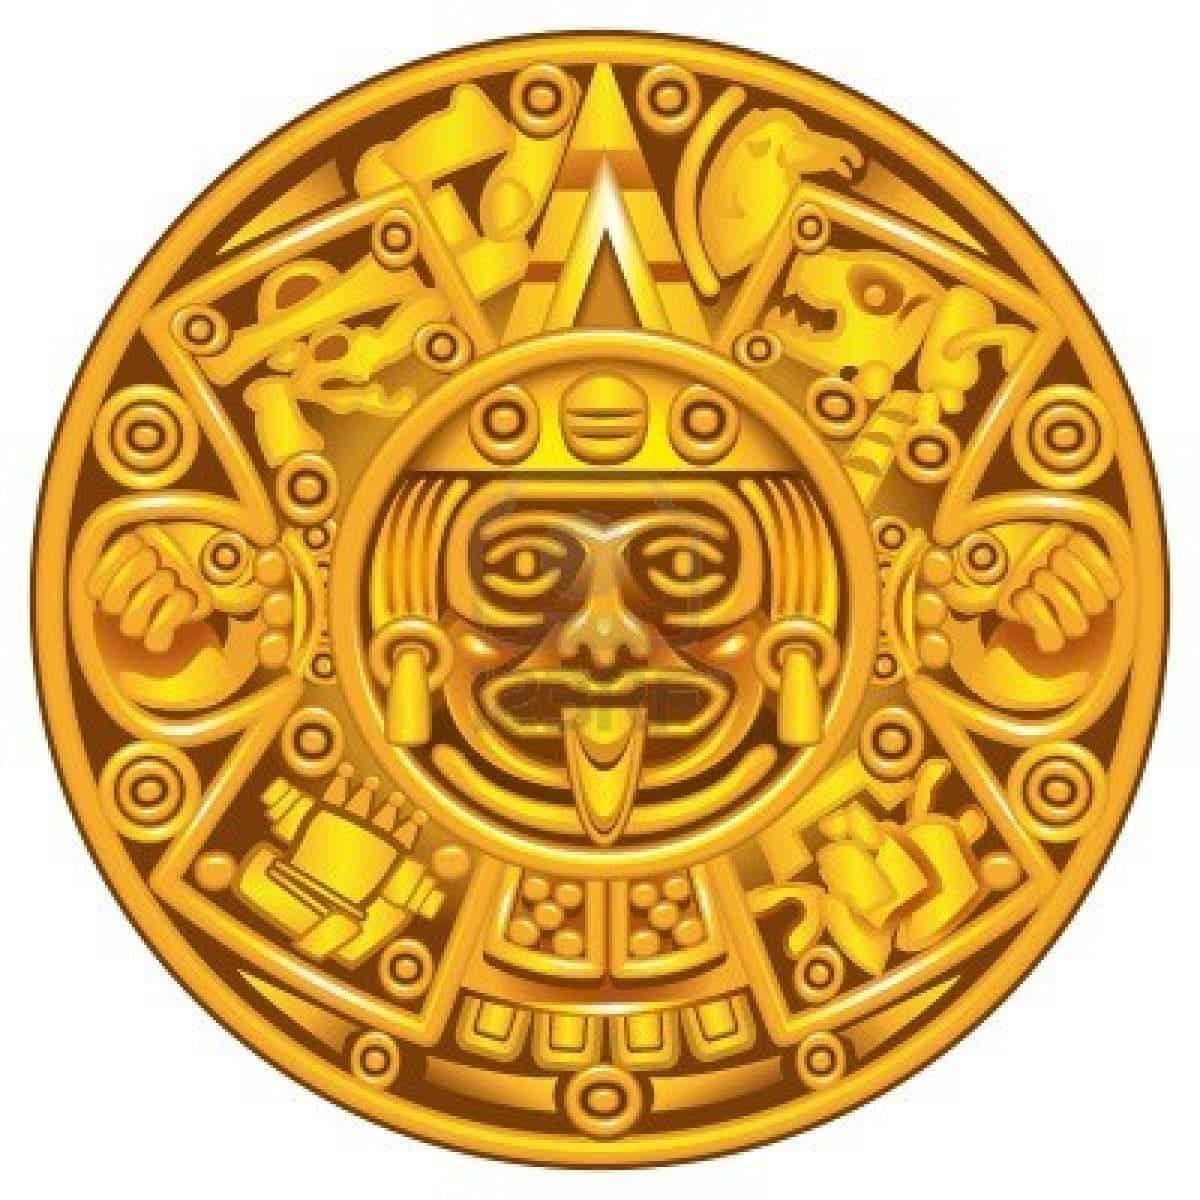 mayan prophecy 21 december debunking maya calendar